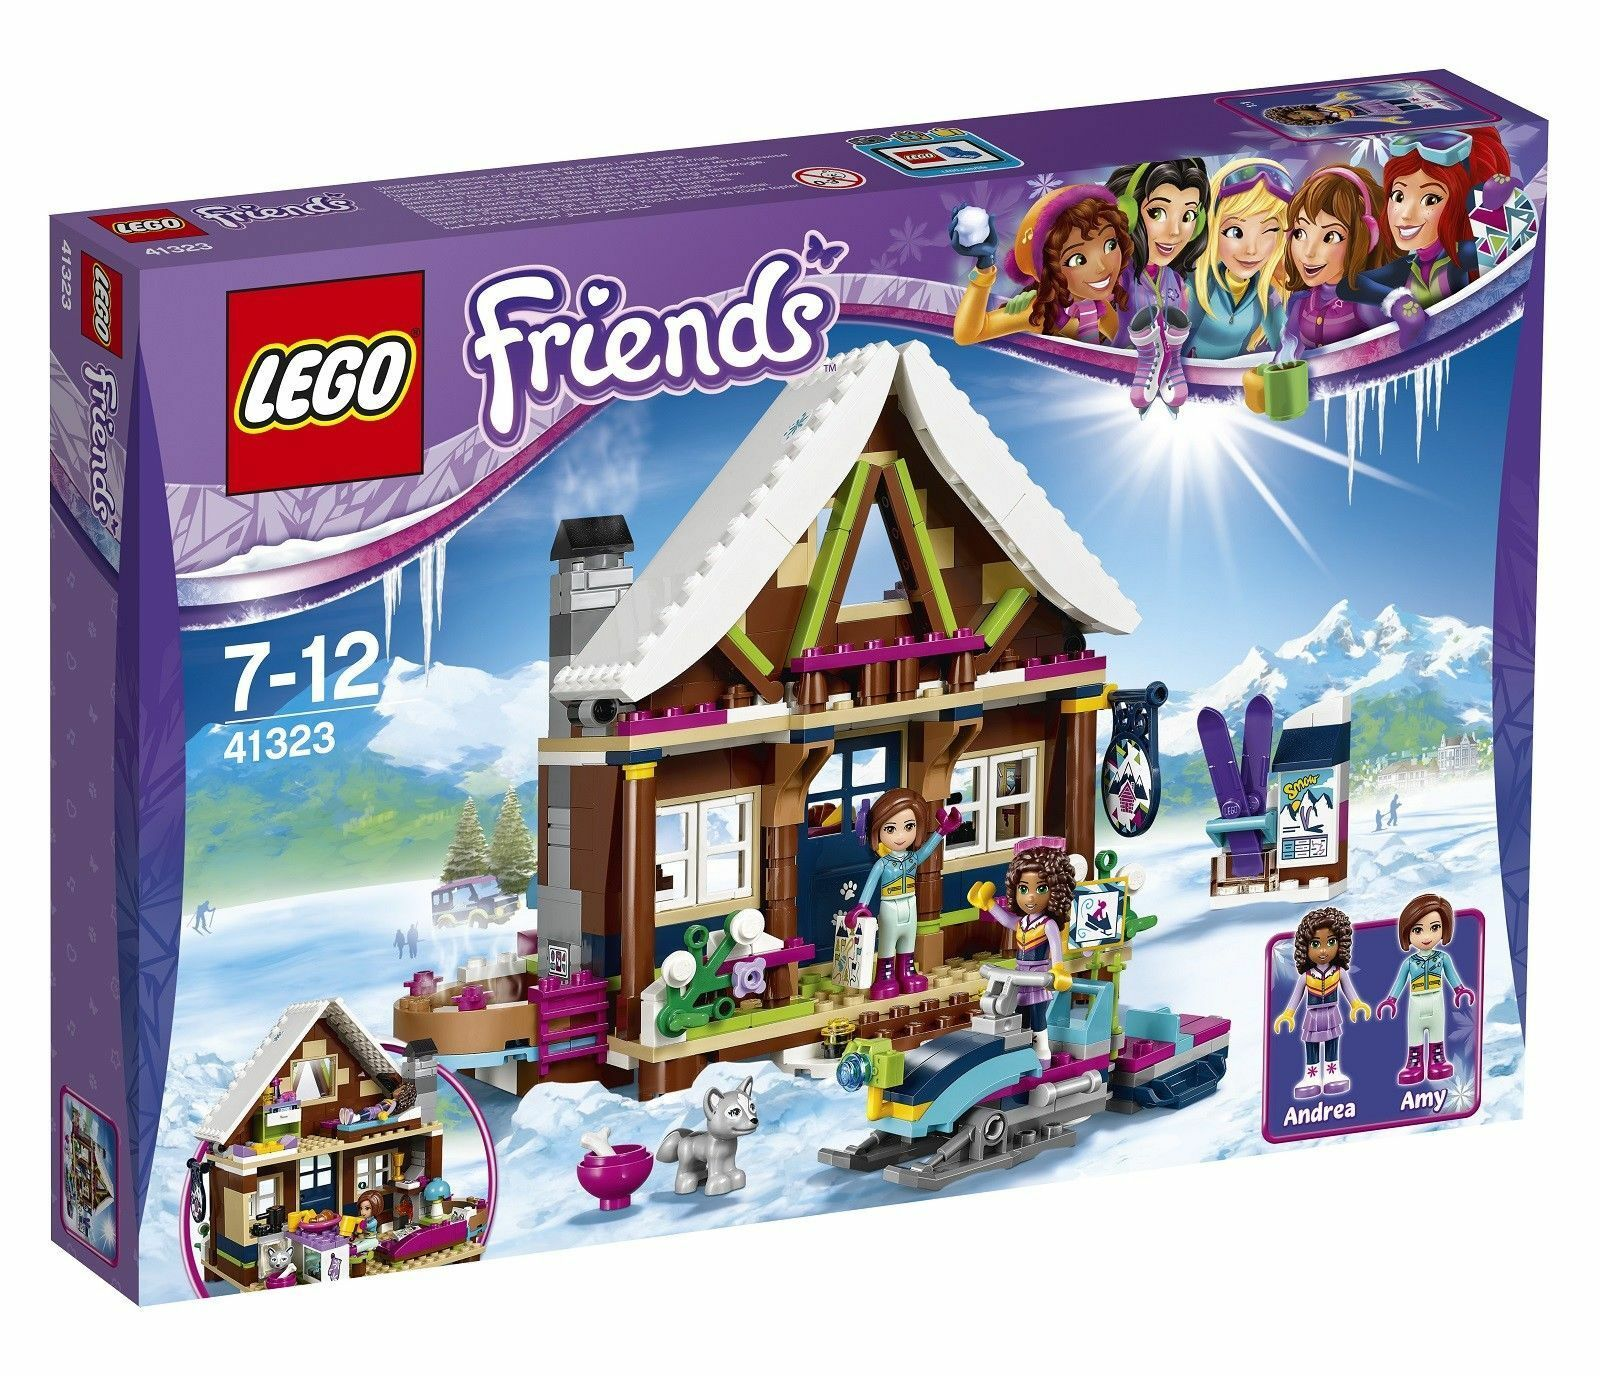 LEGO 41323 Friends Snow Resort Chalet - NEW IN BOX